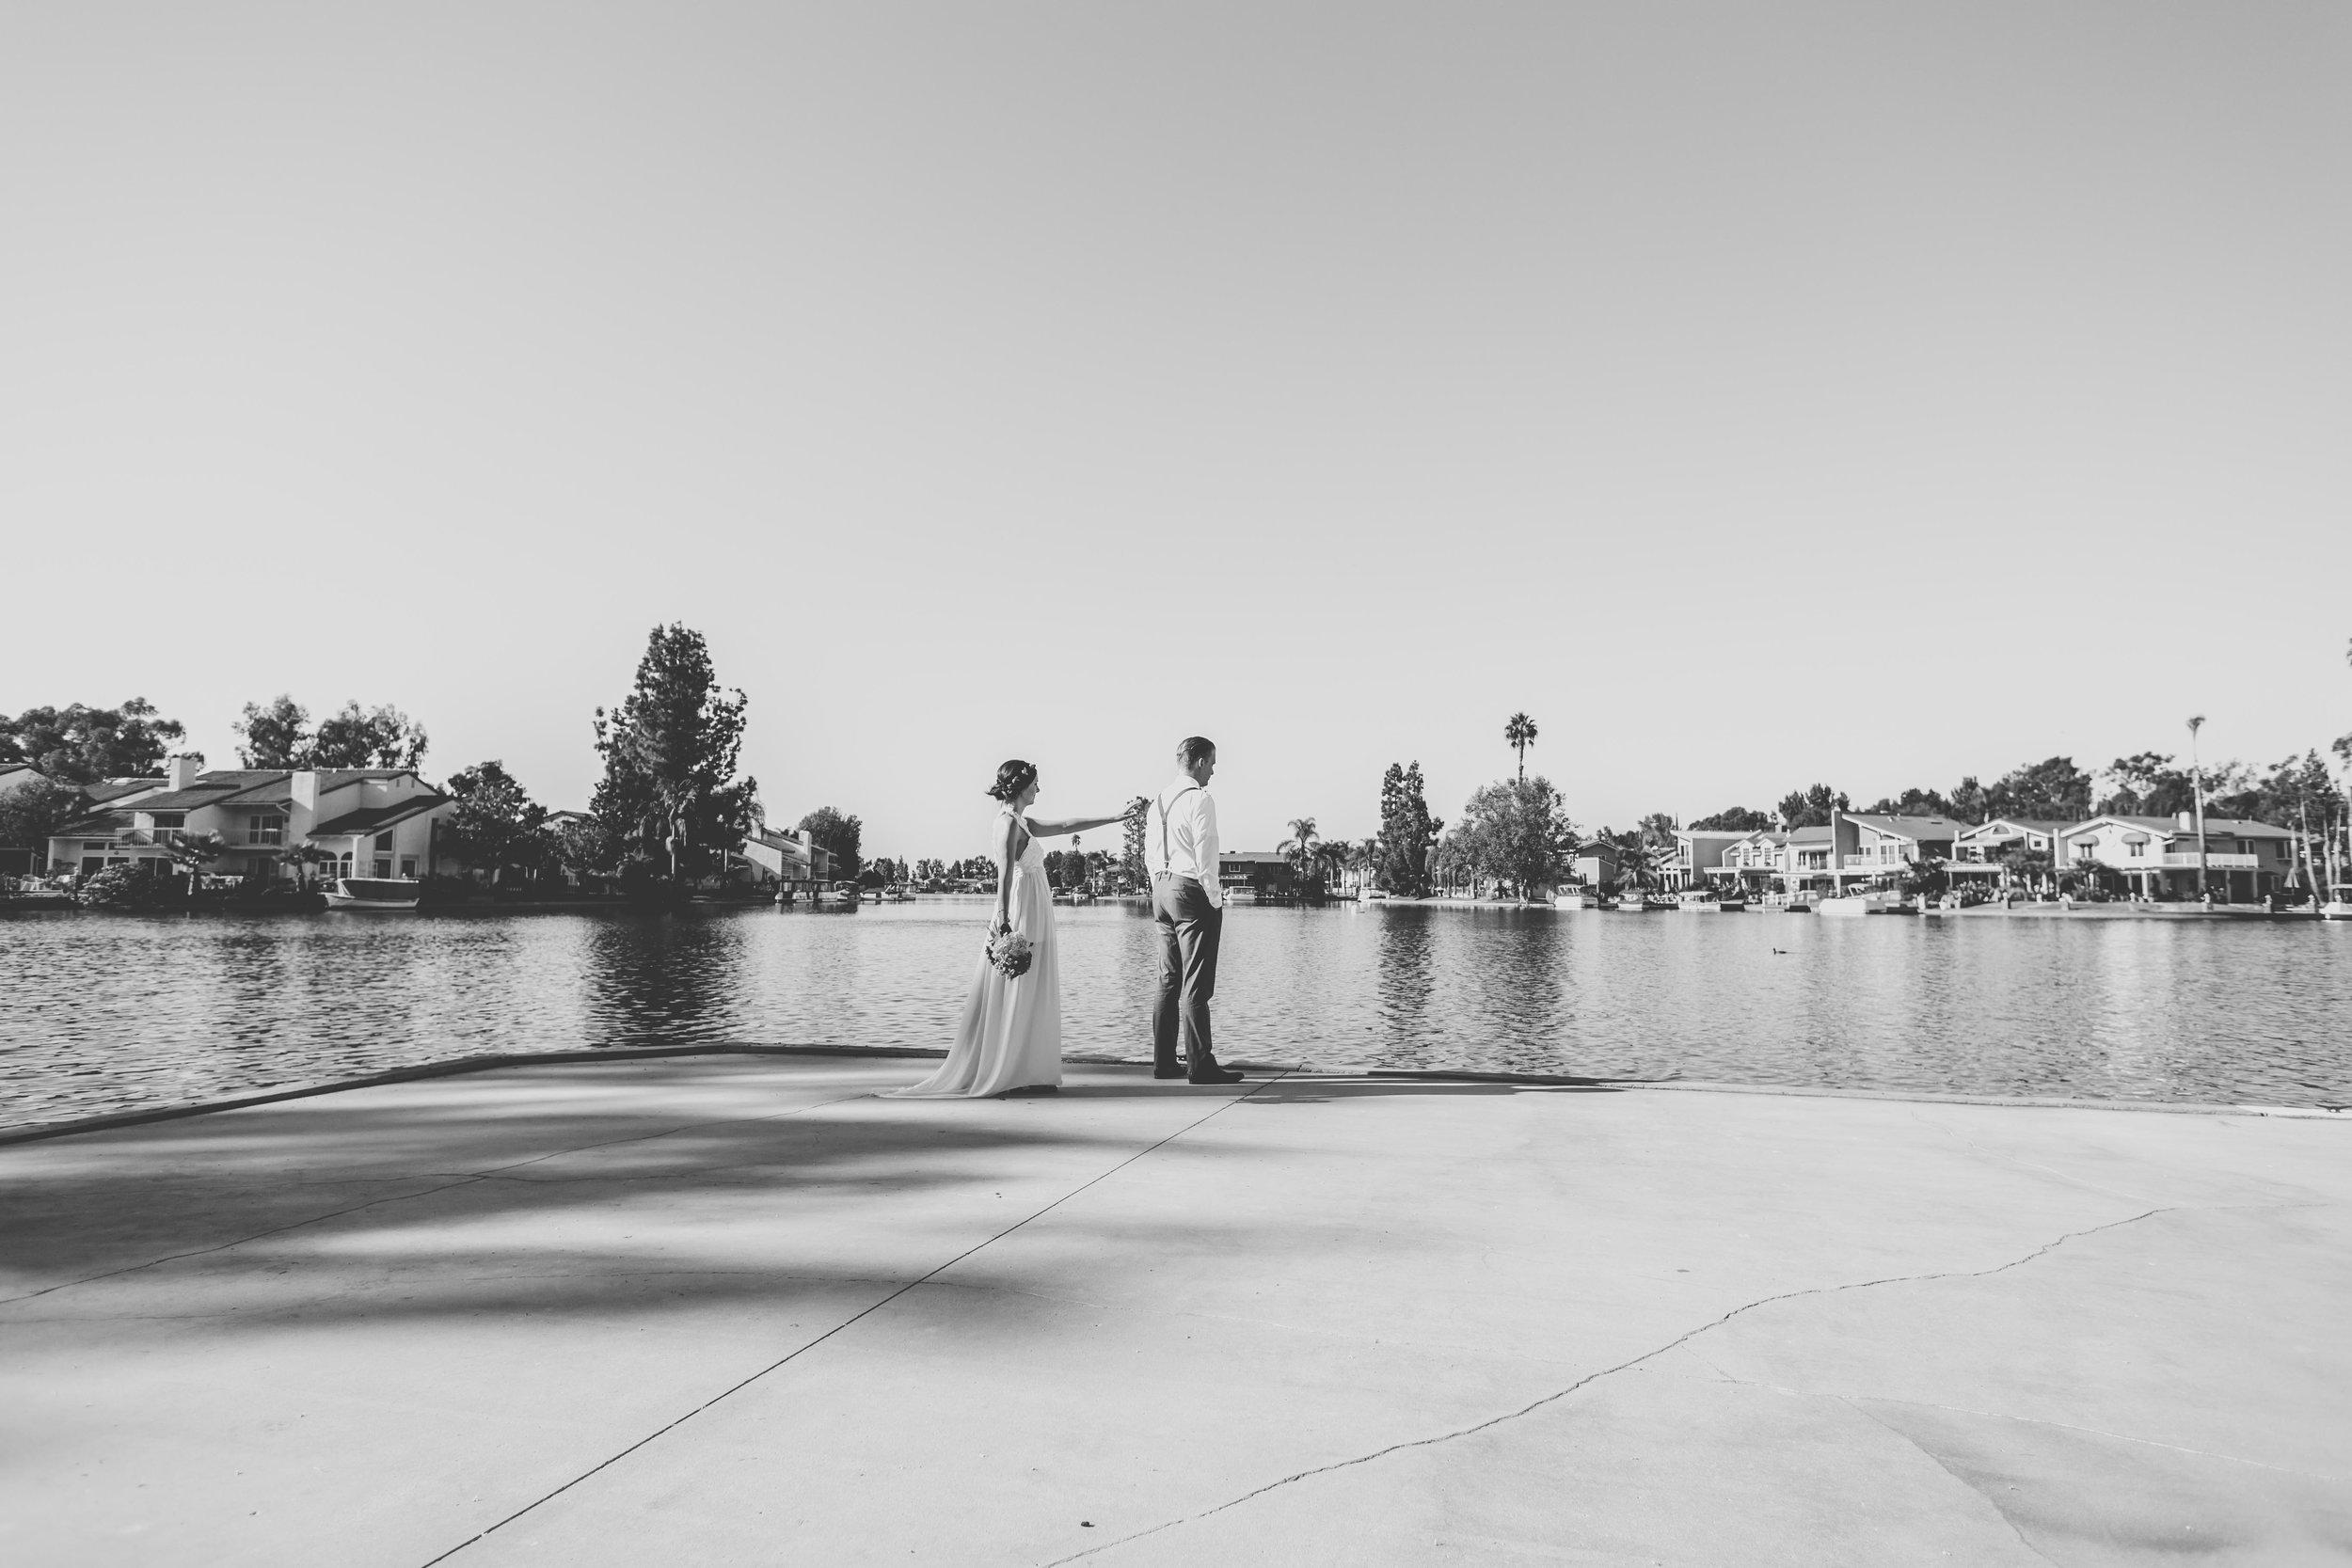 20141024-DePartee-Wedding-APavone-027-sm.jpg